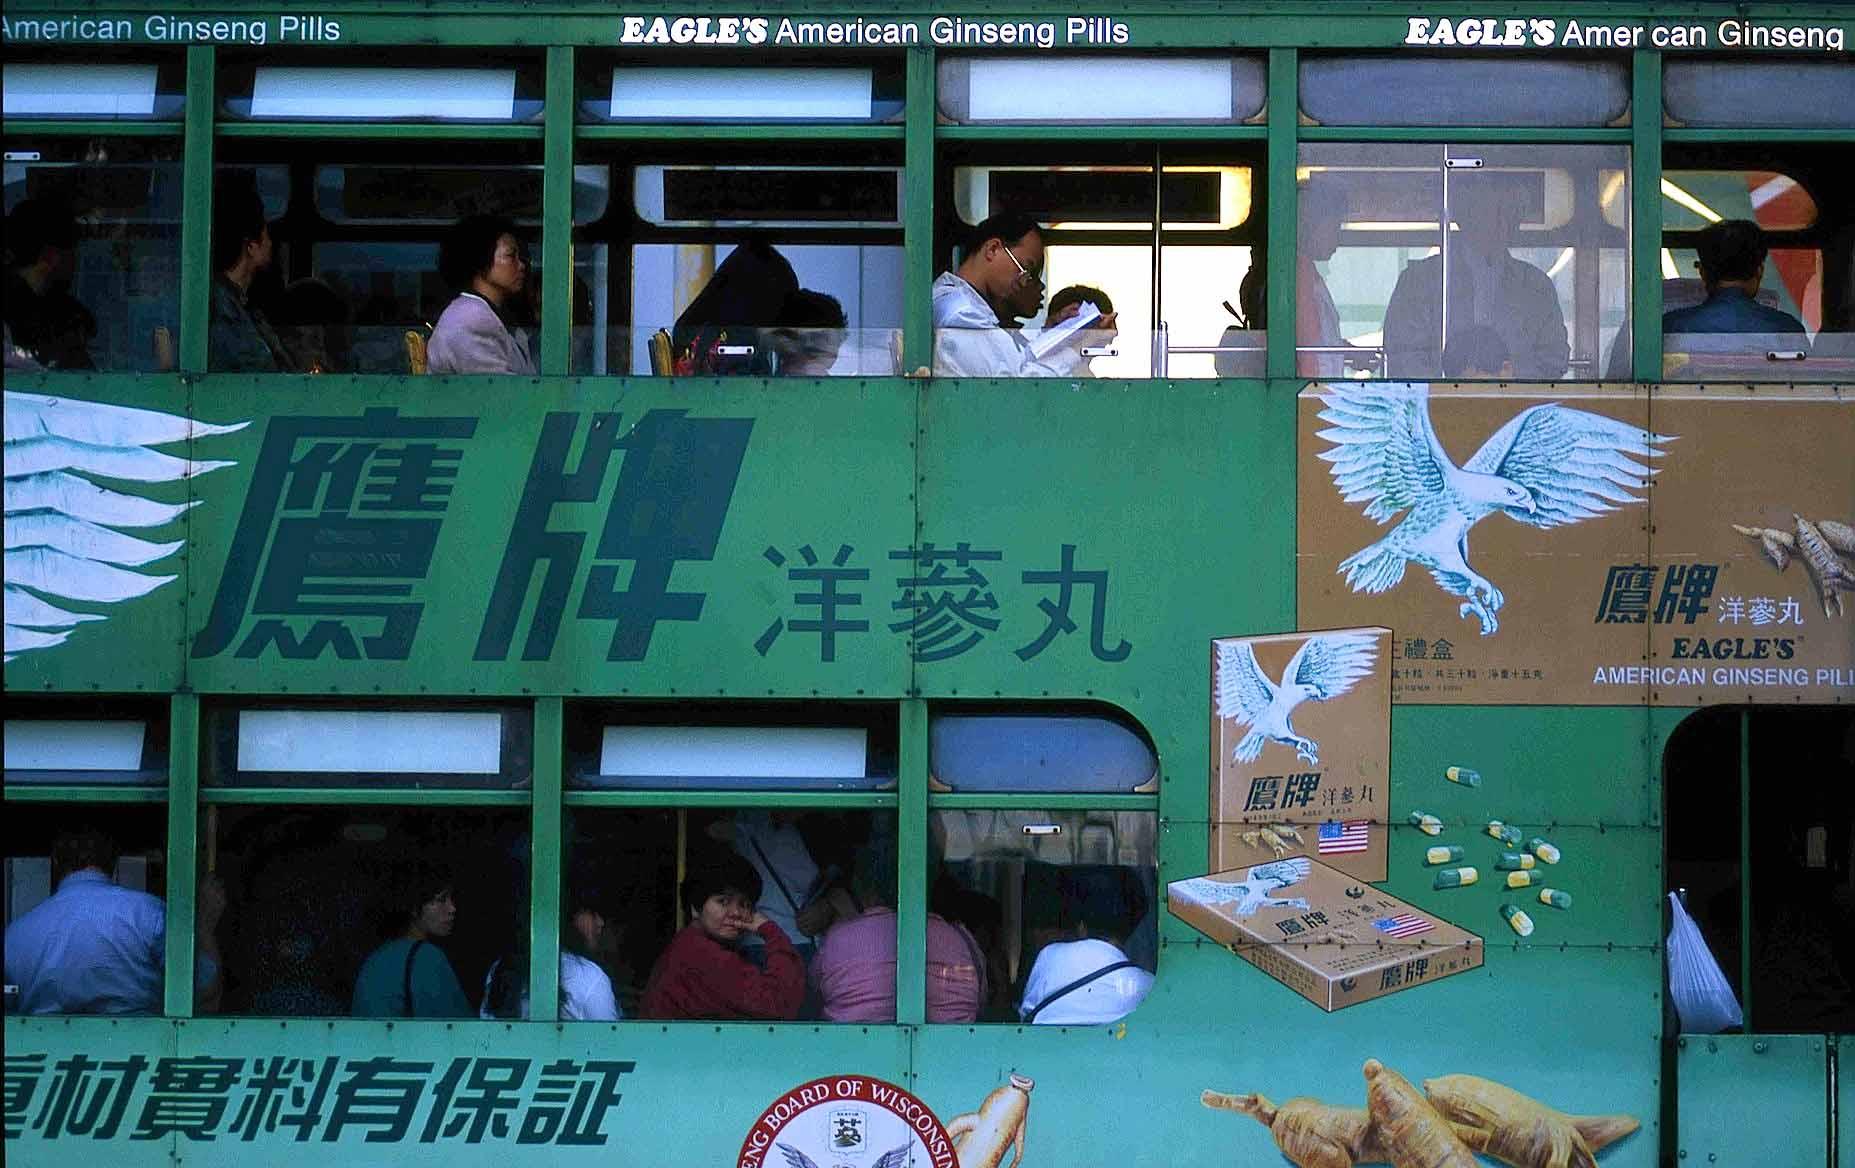 01042014-B aaa Hong Kong 2 rid